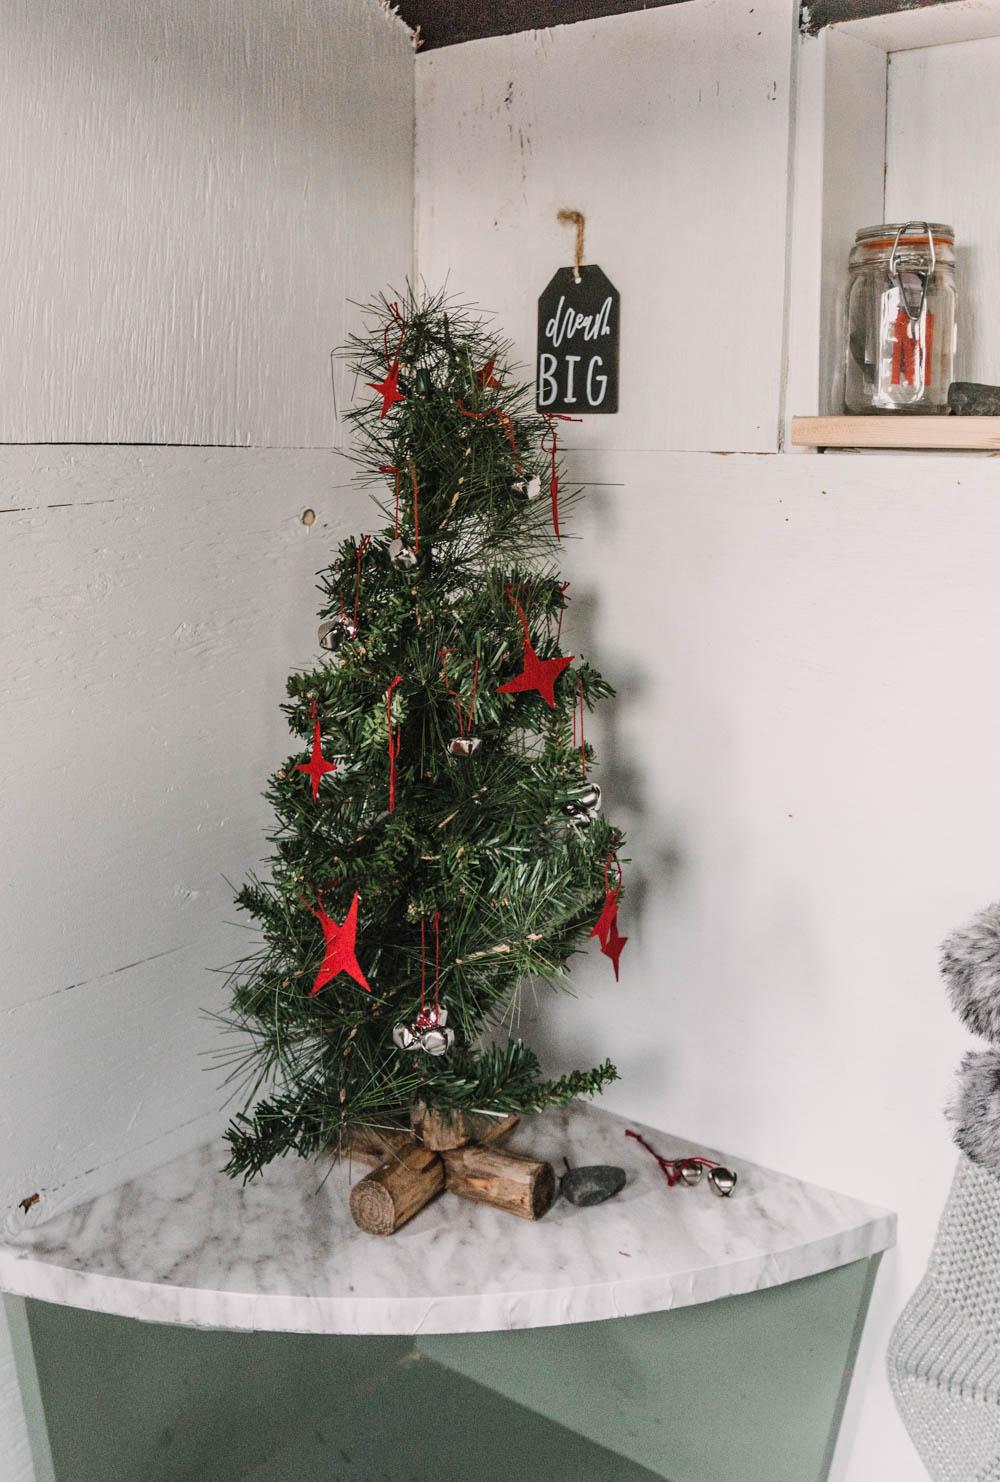 Tiny Christmas Tree for a playhouse